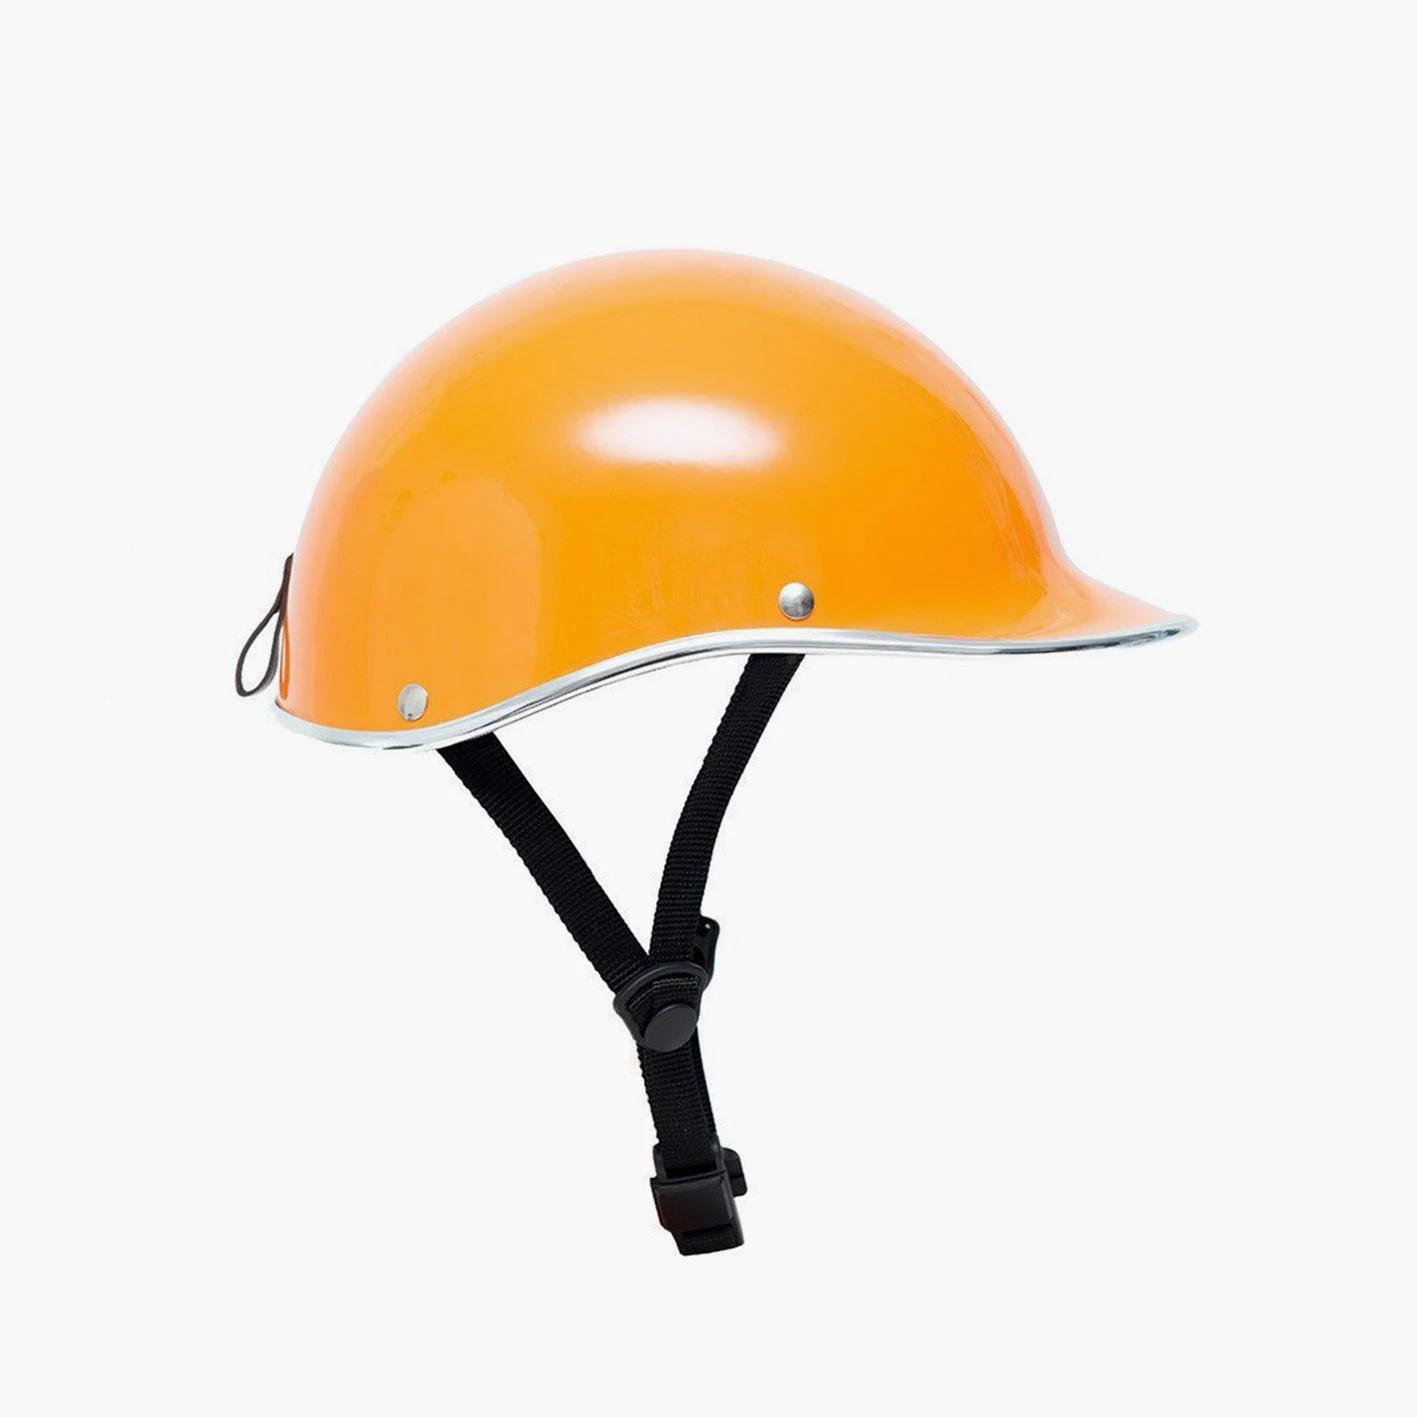 Dashel urban cycling helmet